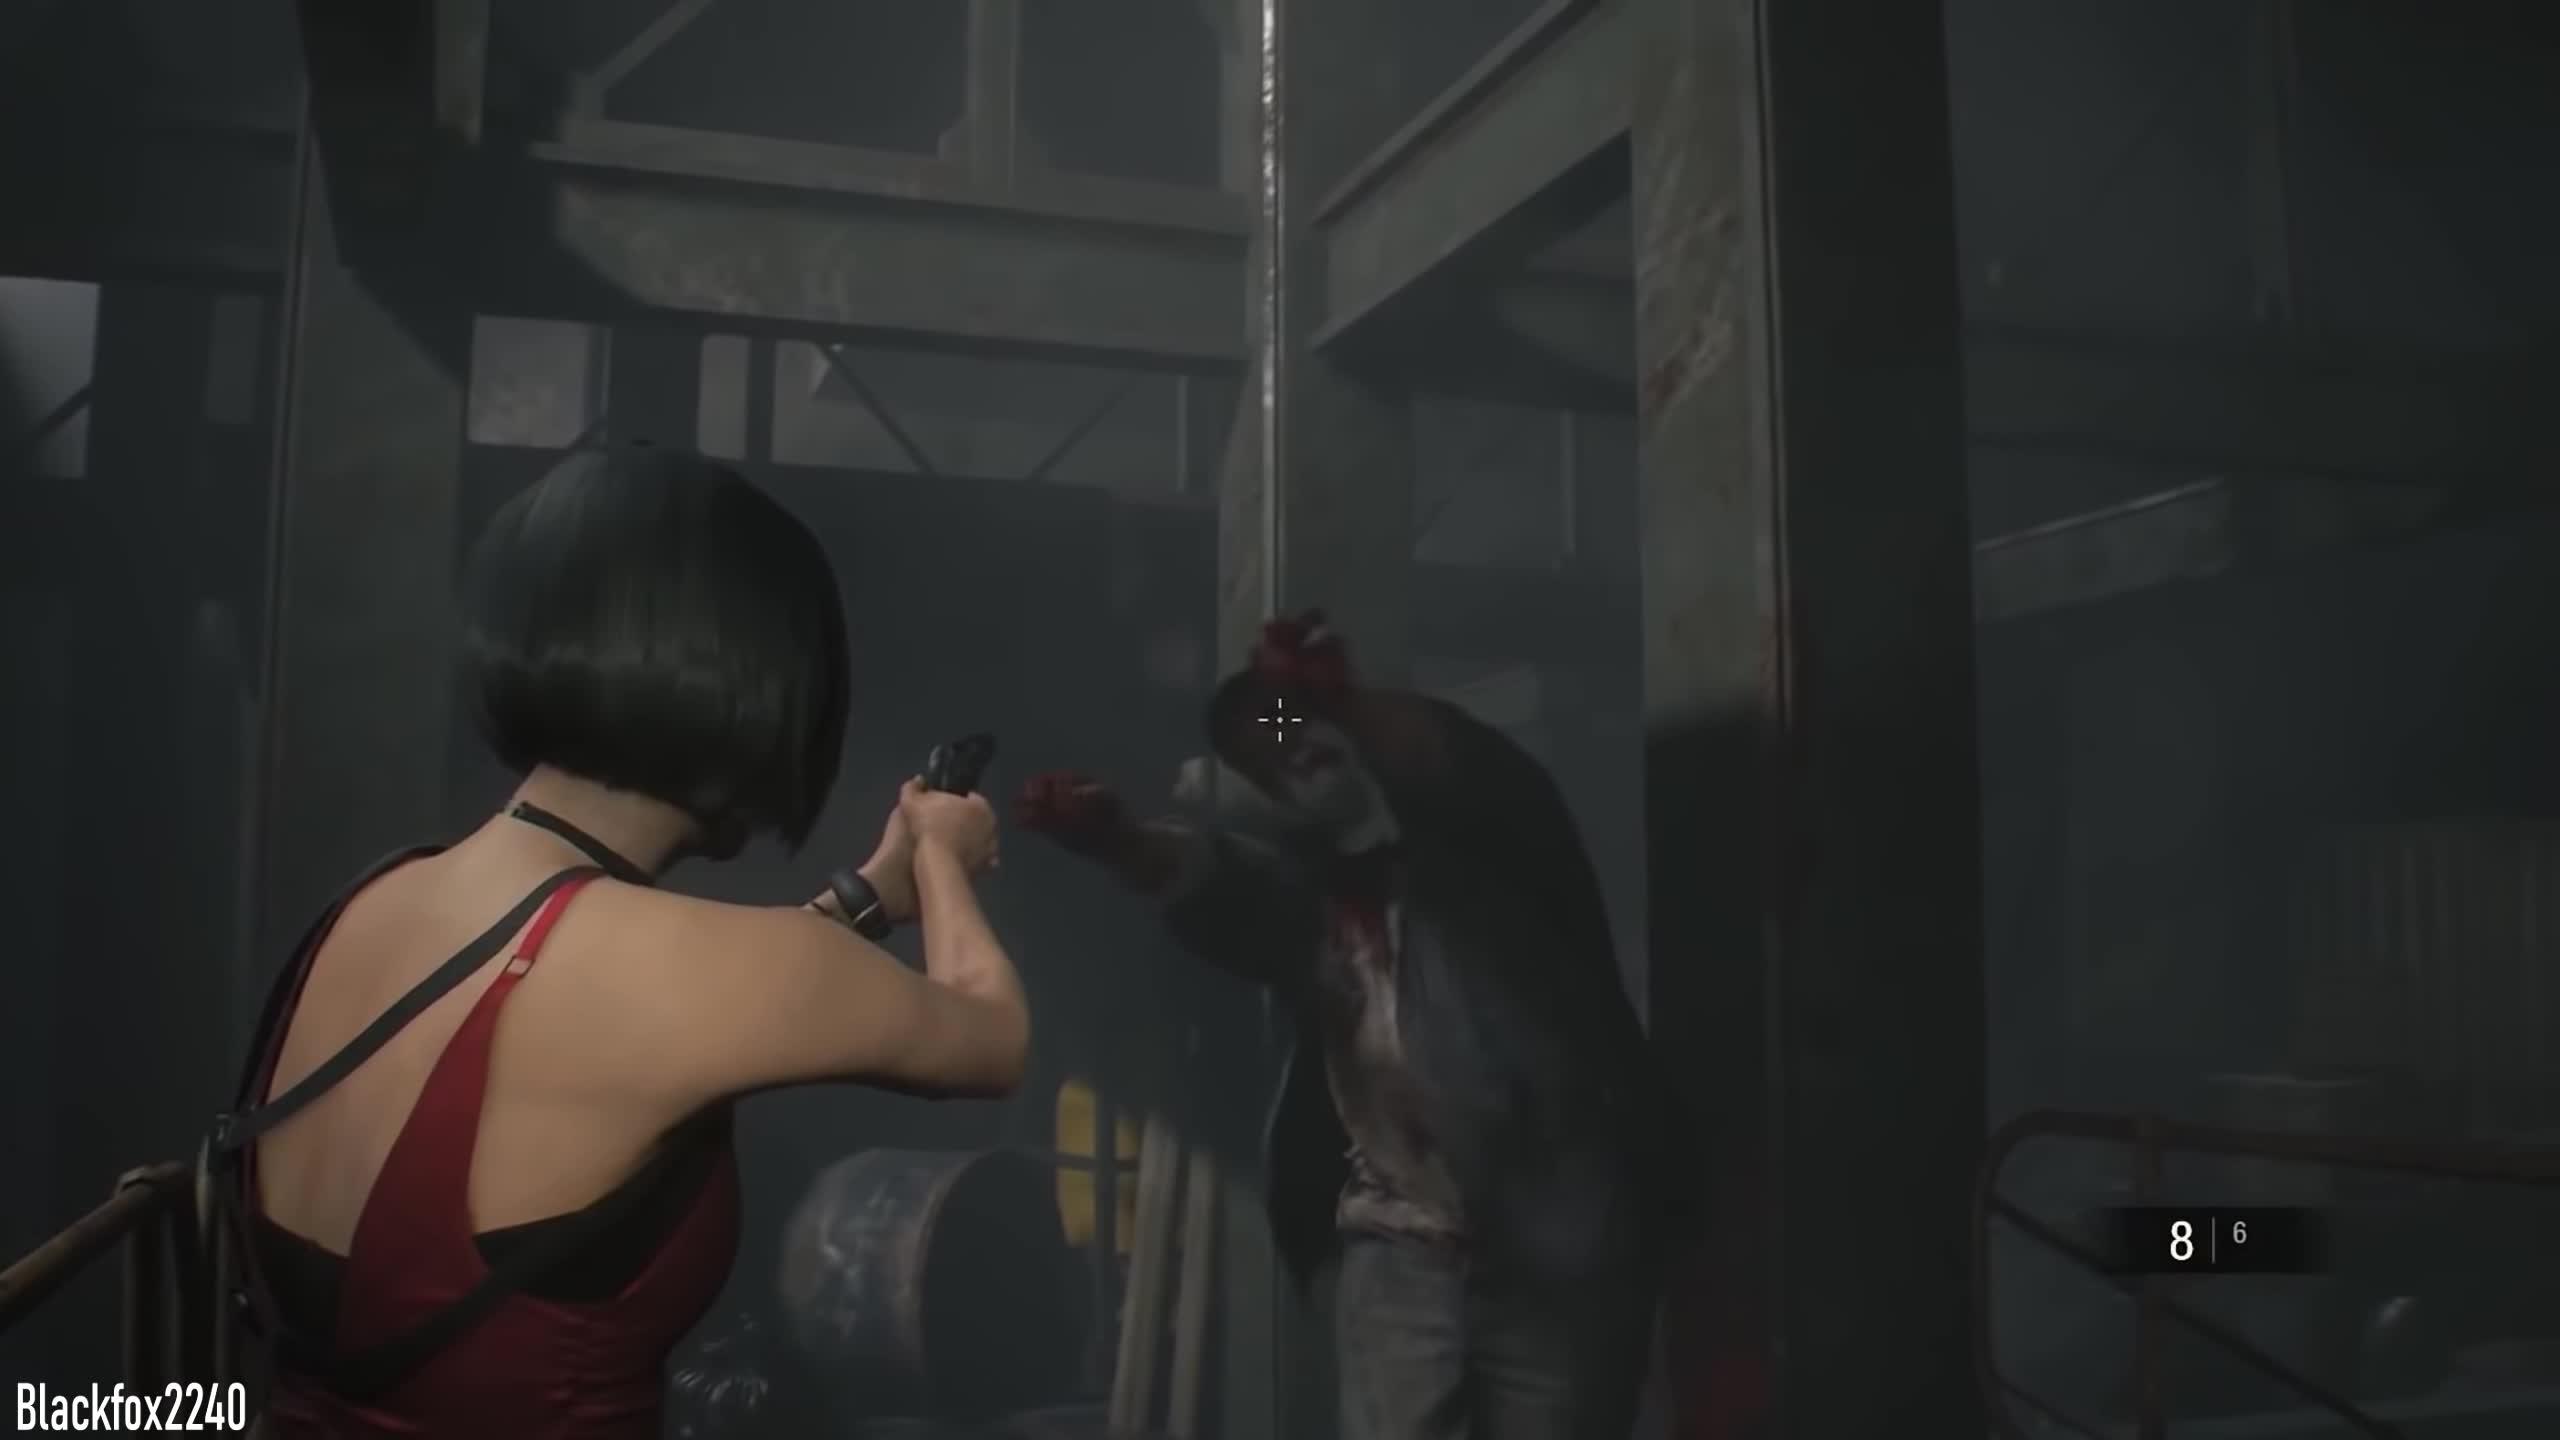 Resident Evil 2 Remake Ada Wong Extended Gameplay 1440p 60fps